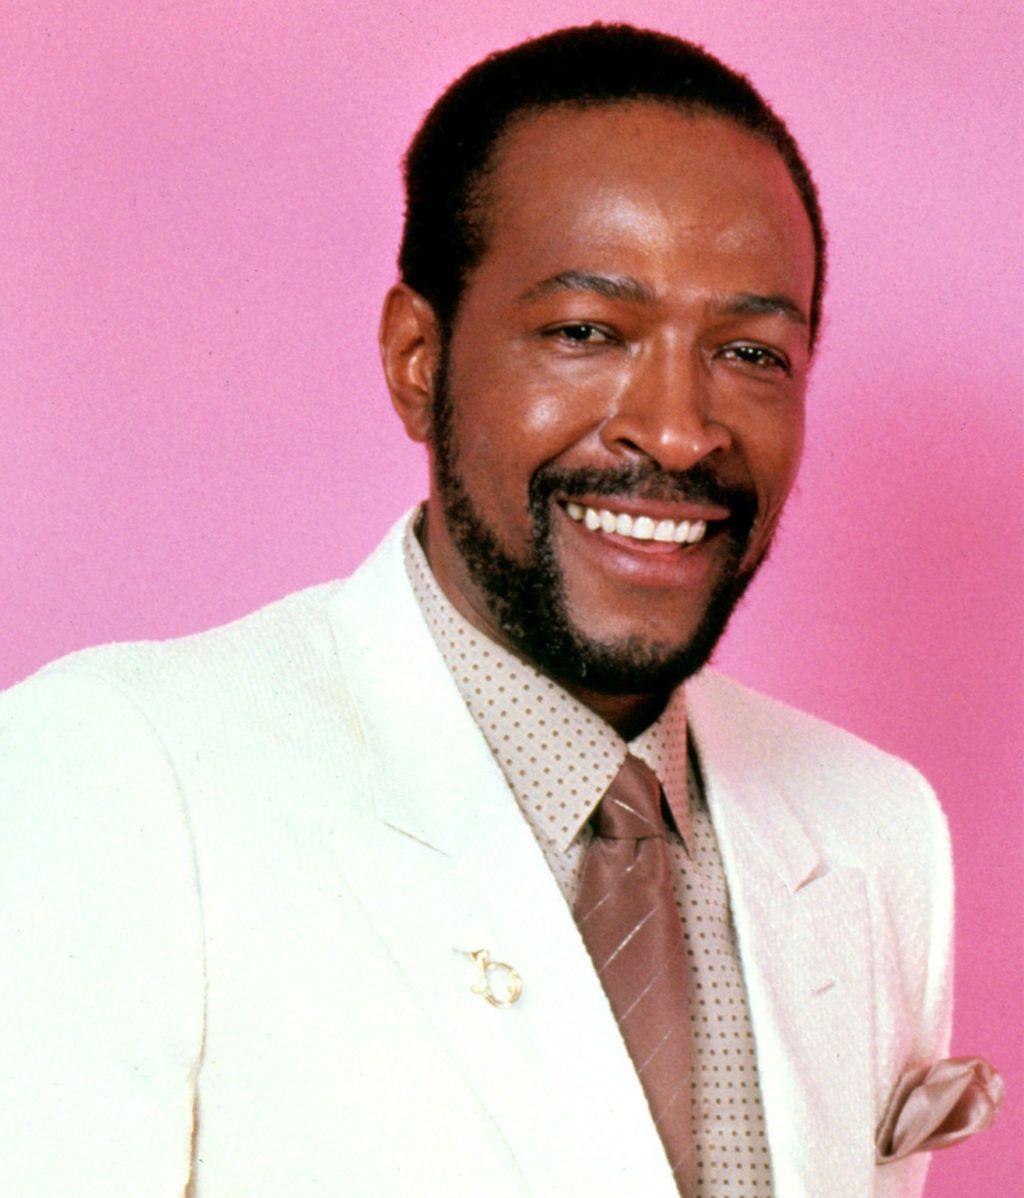 Marvin Gaye, en una imagen promocinal de 'Motown' (1983)